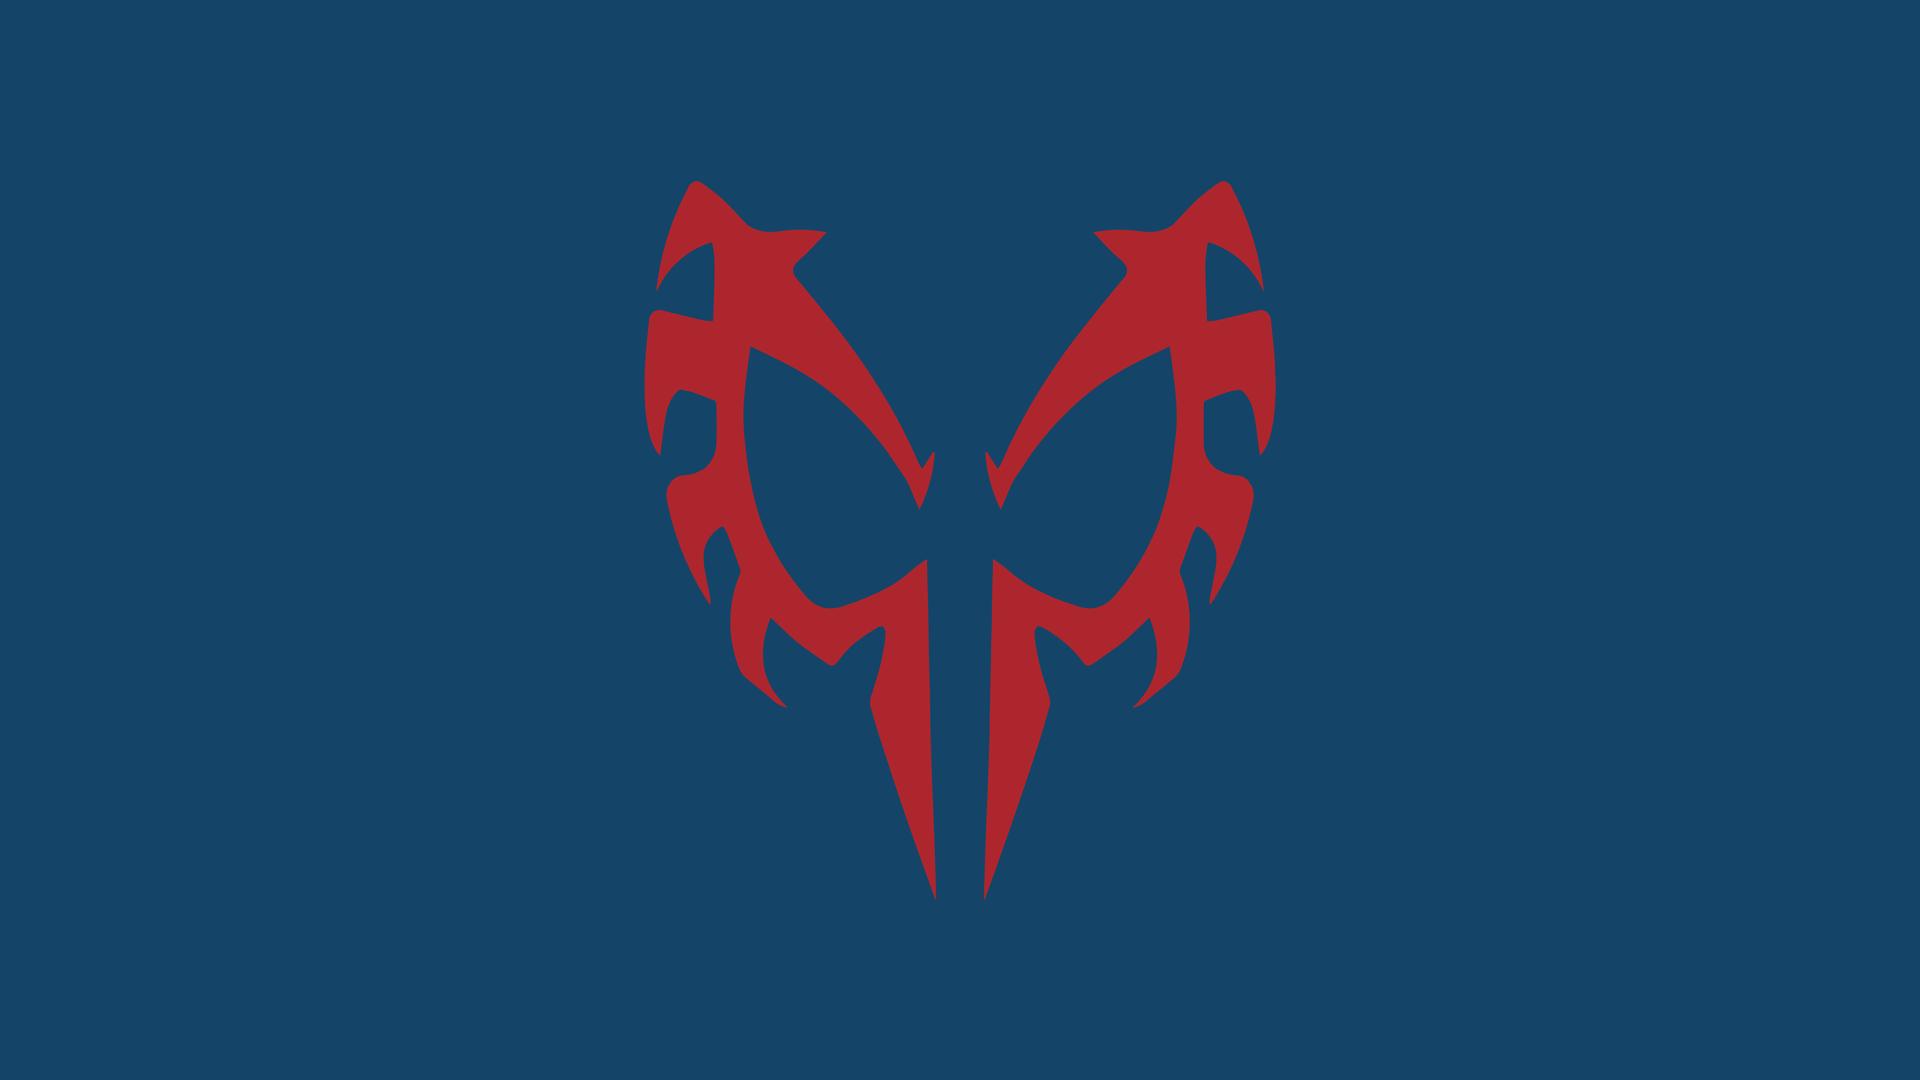 Cool Spiderman 2099 Wallpaper: Spider-Man 2099 Logo HD Wallpaper